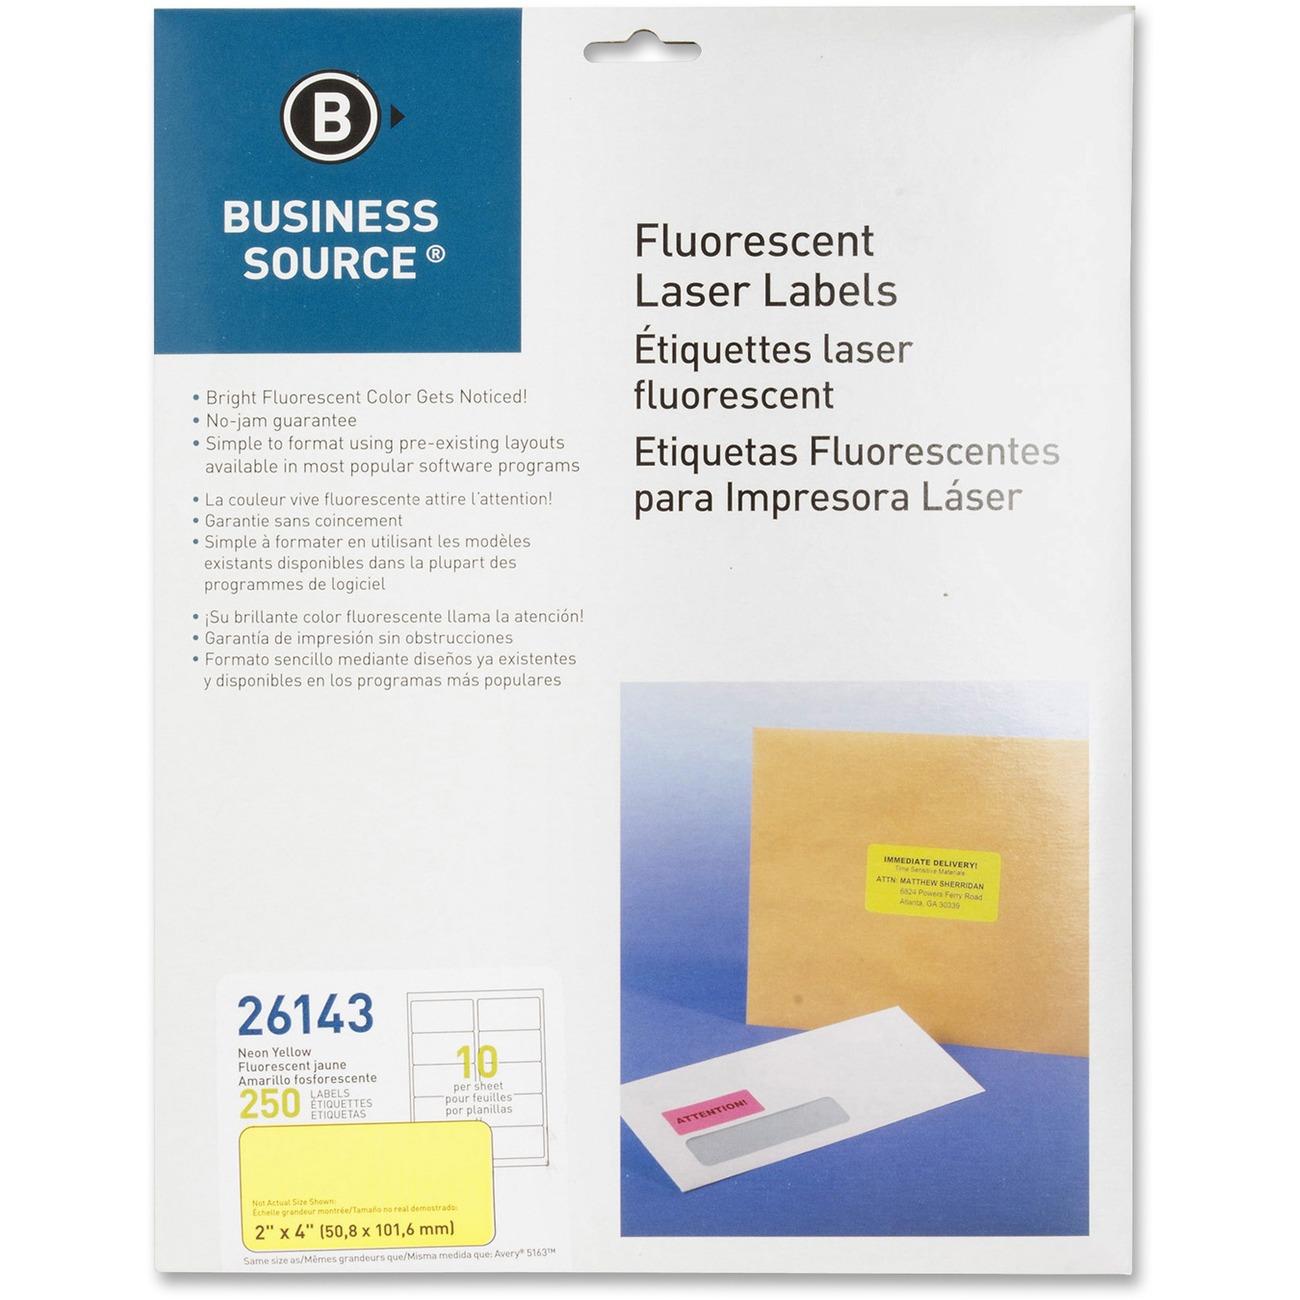 Labels Are Designed For Jam Free Performance In Desktop Laser Printers Feature Pressure Sensitive Permanent Adhesive